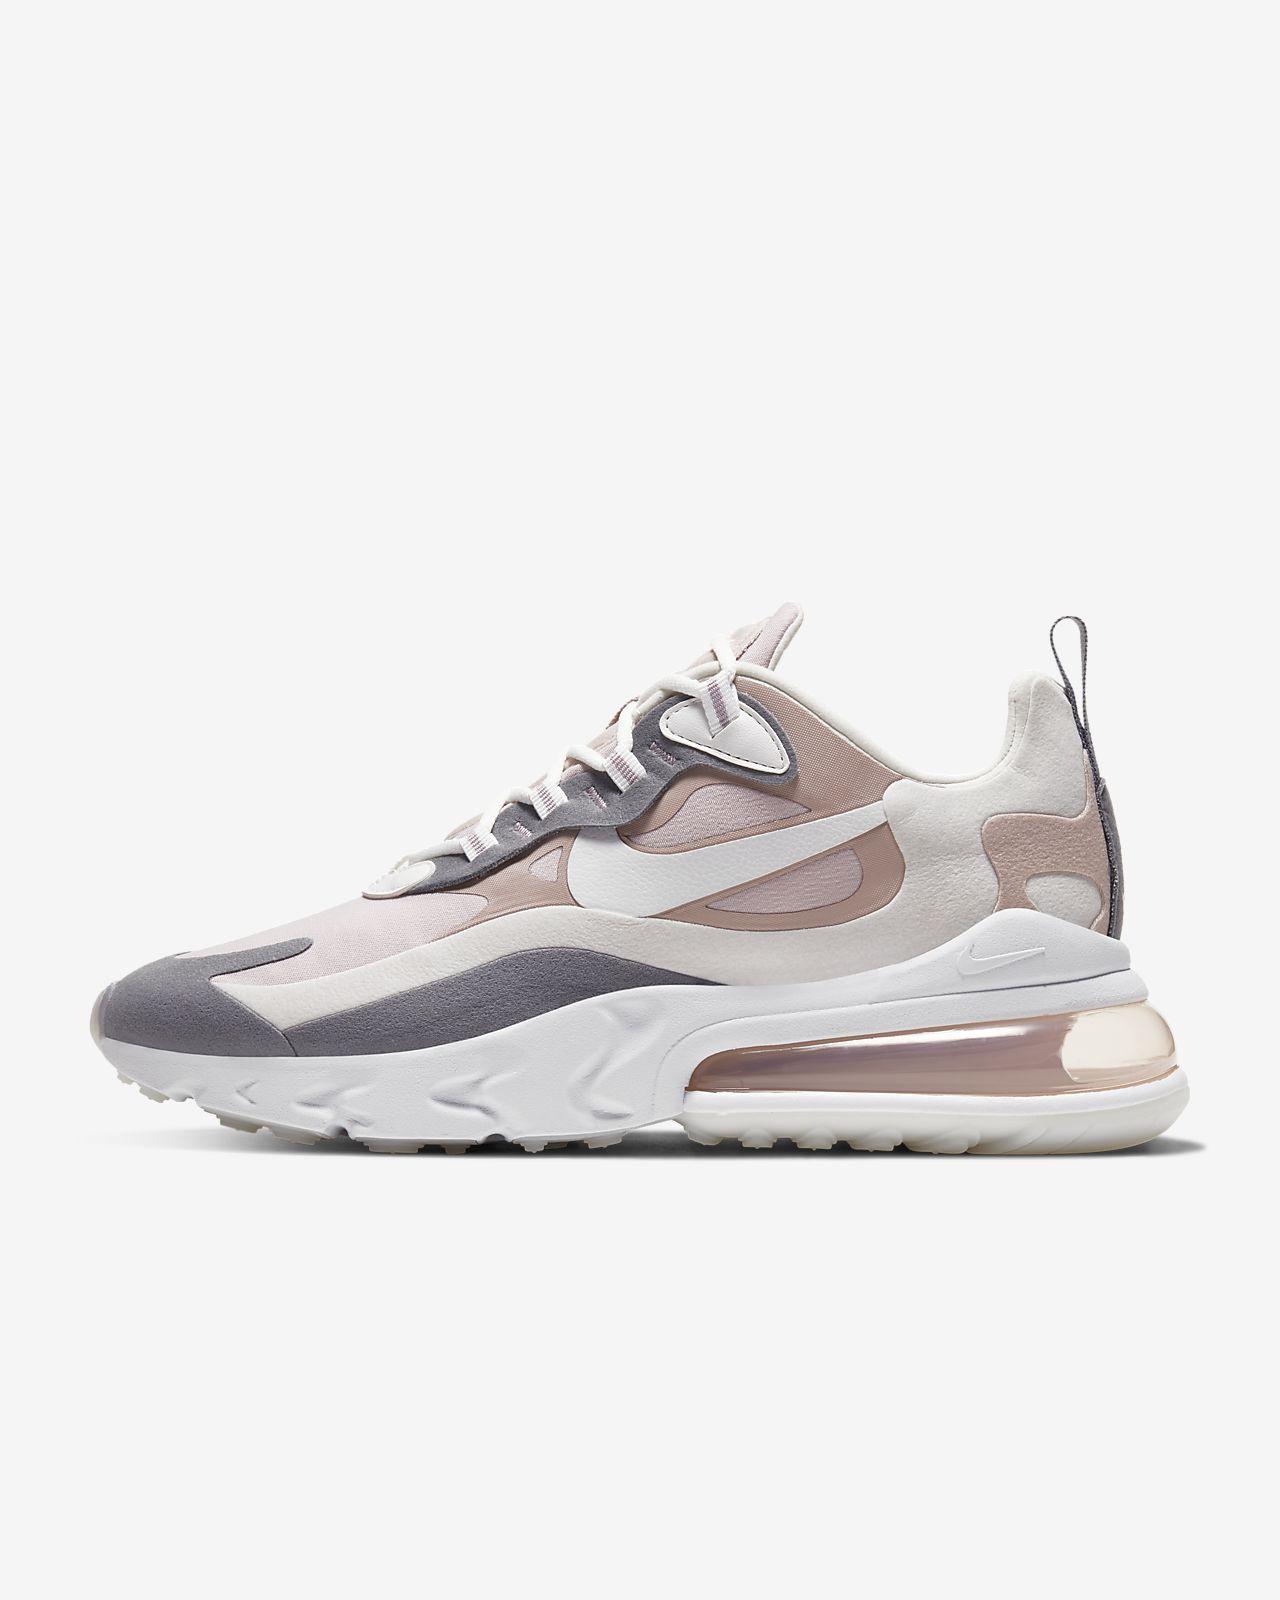 Air Max 97 Lx Sneakers Nike Air Max 270 React